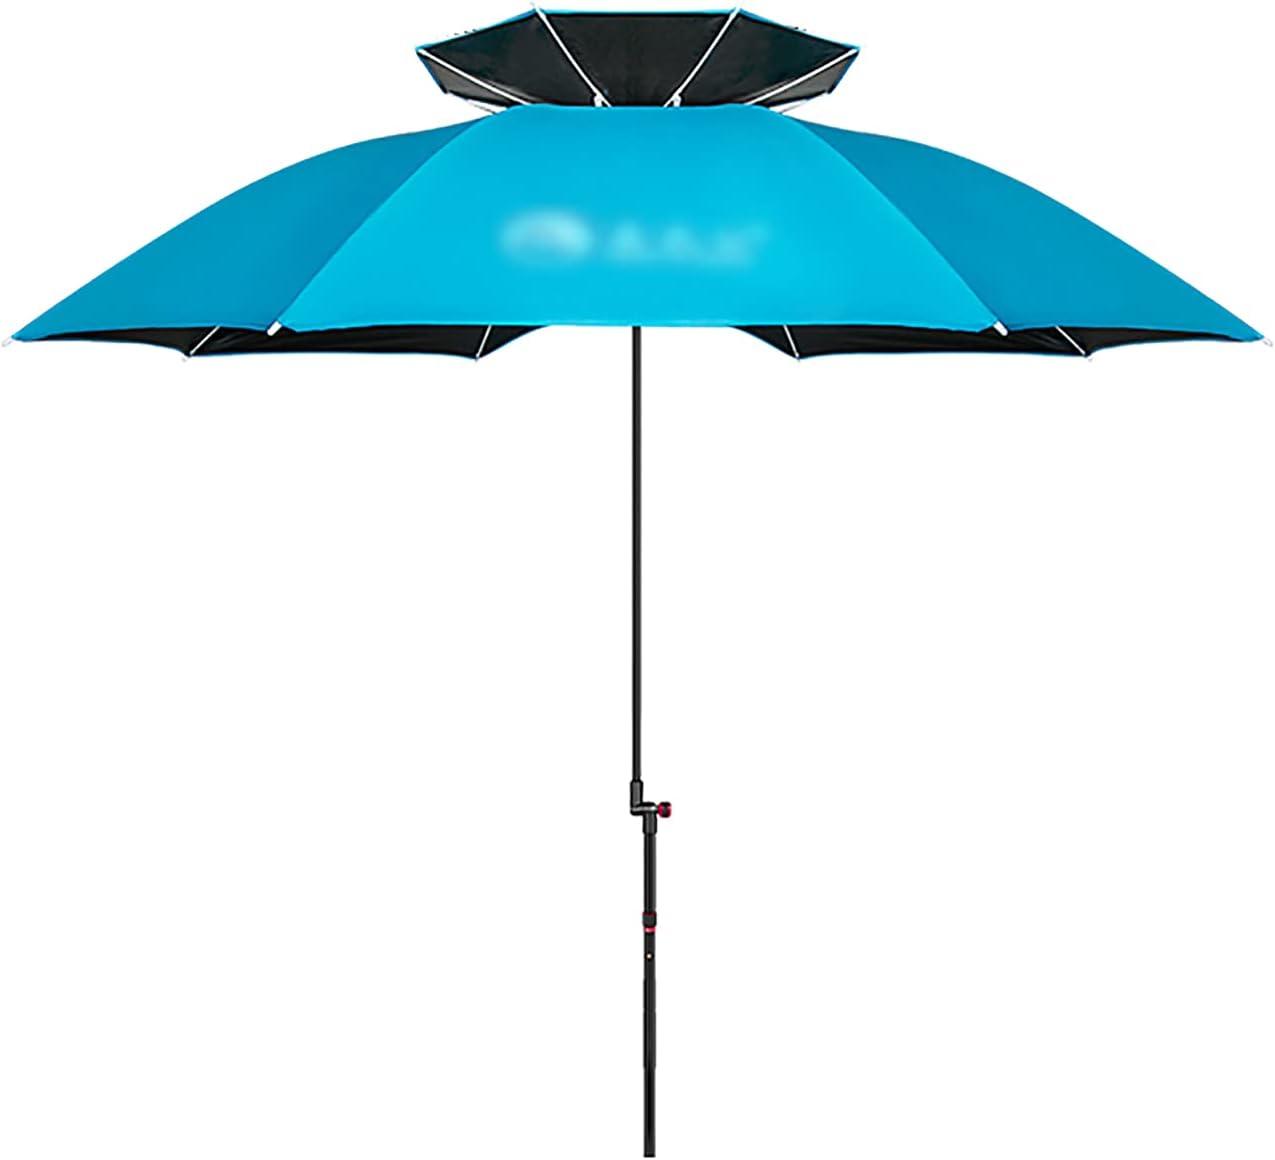 DFYR Beach Umbrella with Sand Portable Tilt Mechanism Anchor Louisville-Jefferson County Max 81% OFF Mall